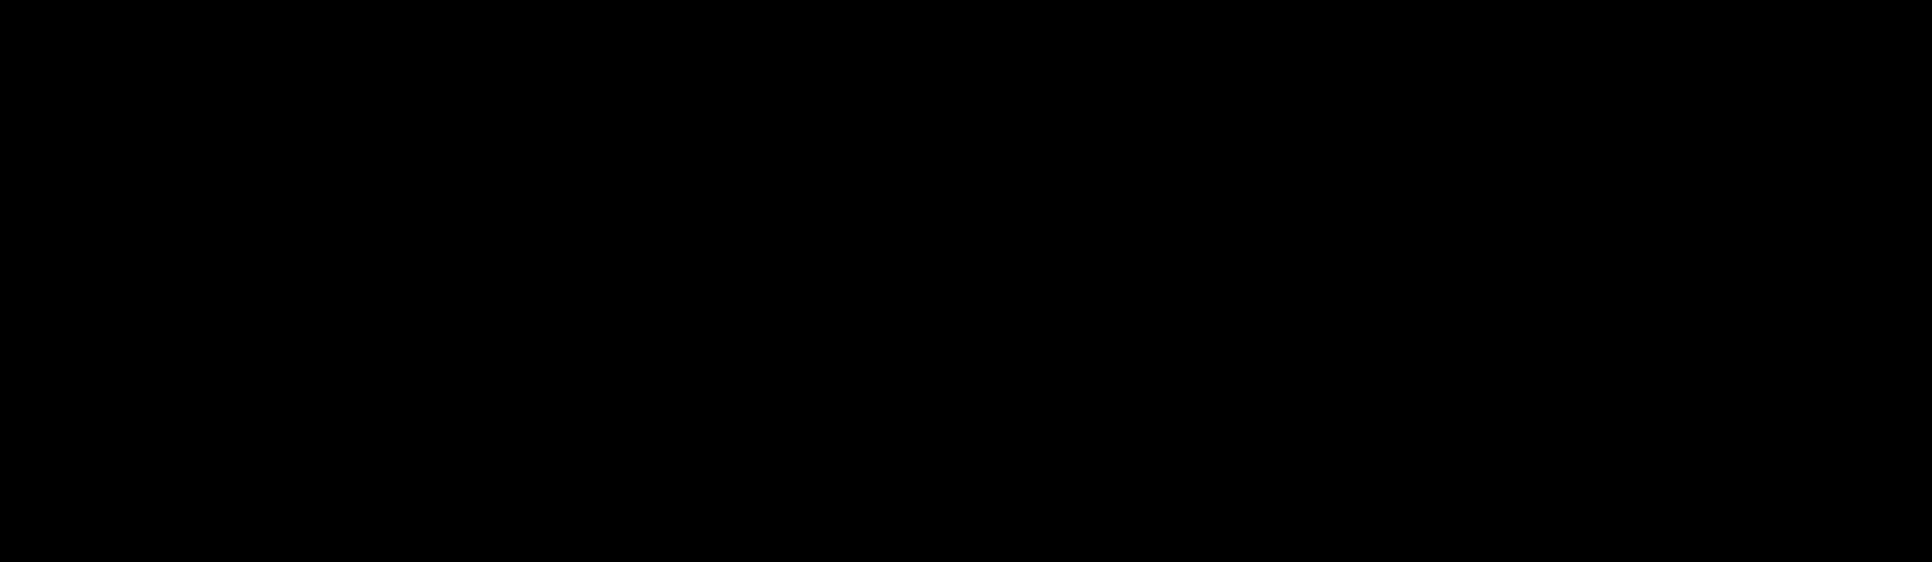 Ibuprofen acyl-β-D-glucuronide